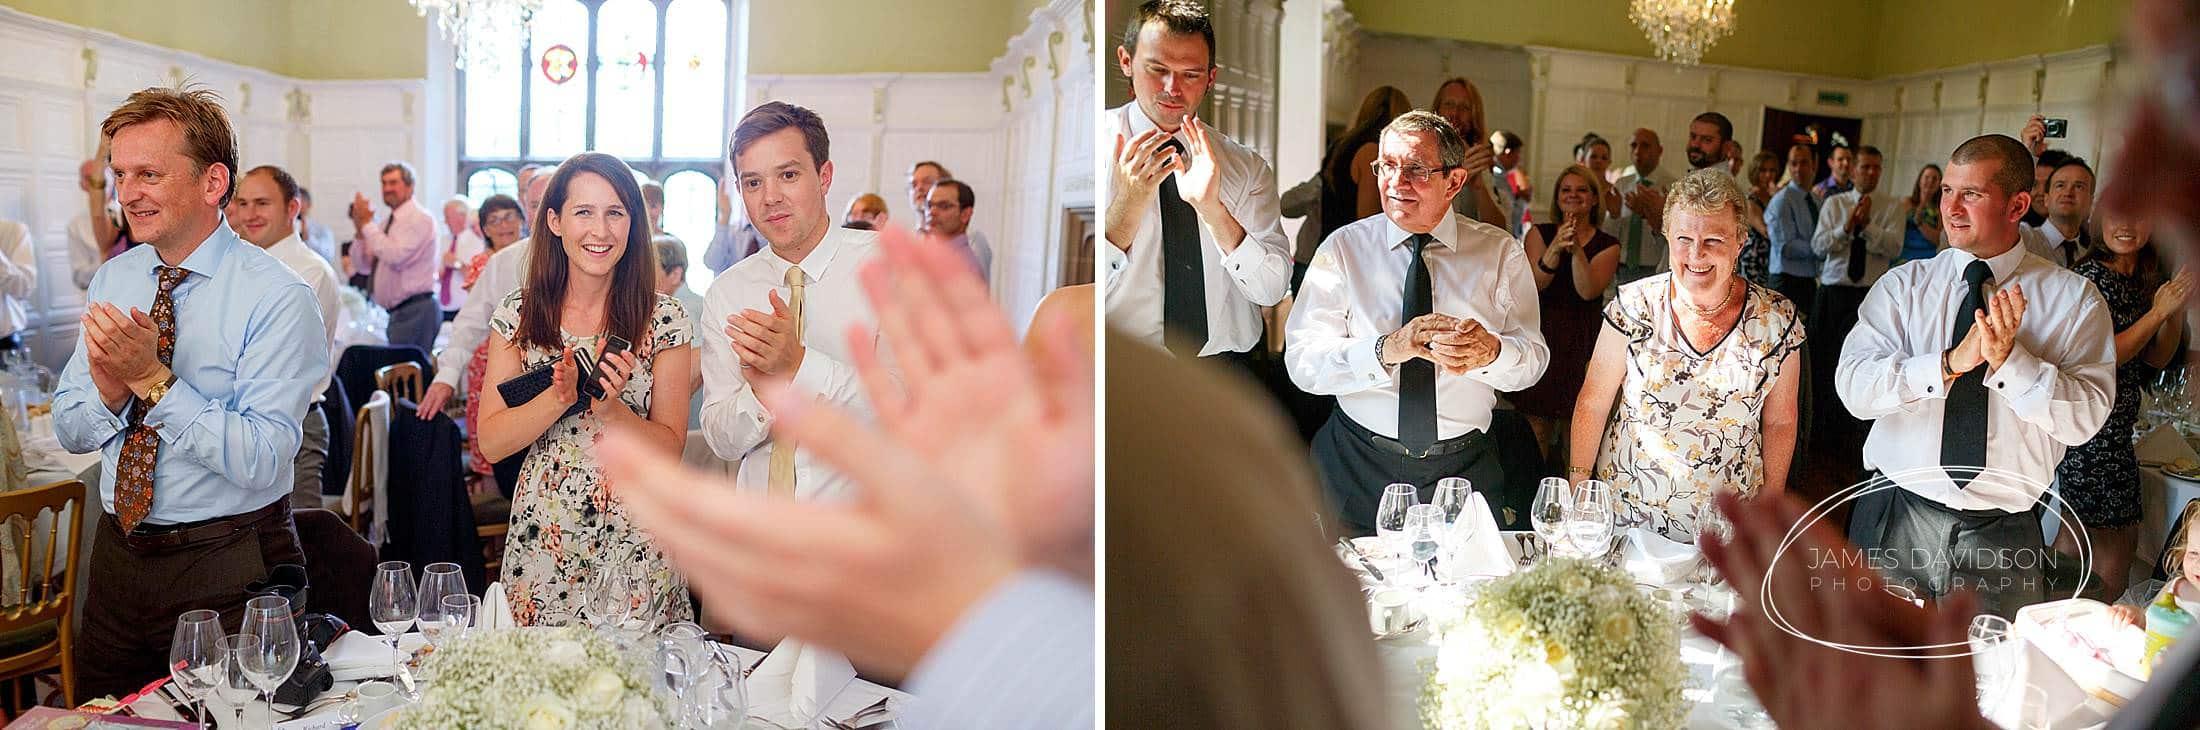 hengrave-hall-summer-wedding-064